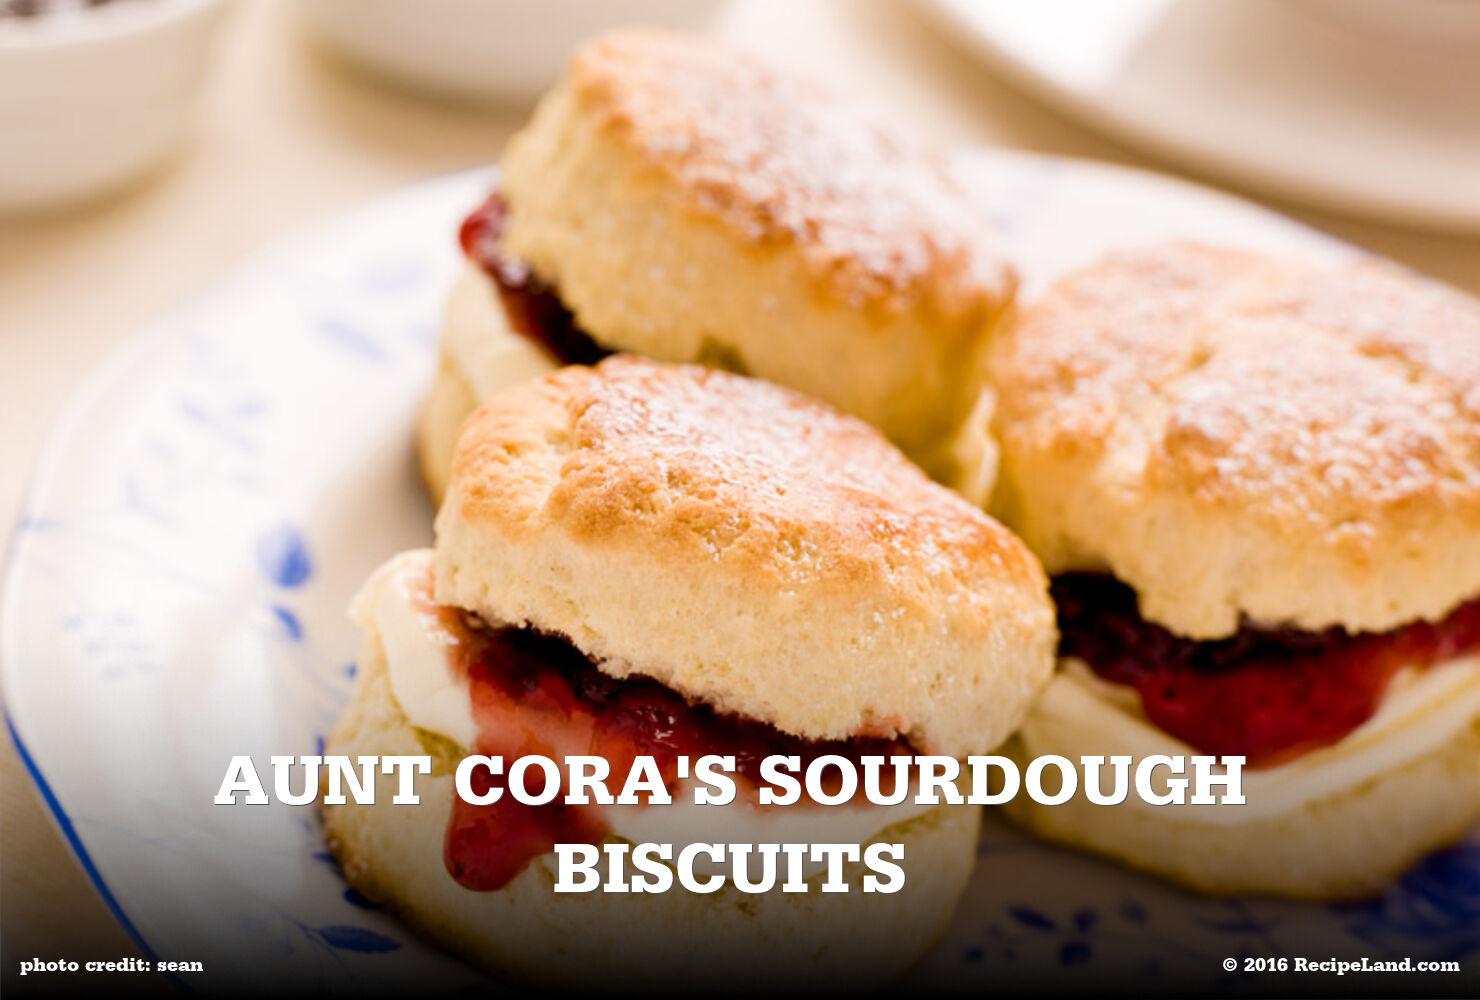 Aunt Cora's Sourdough Biscuits